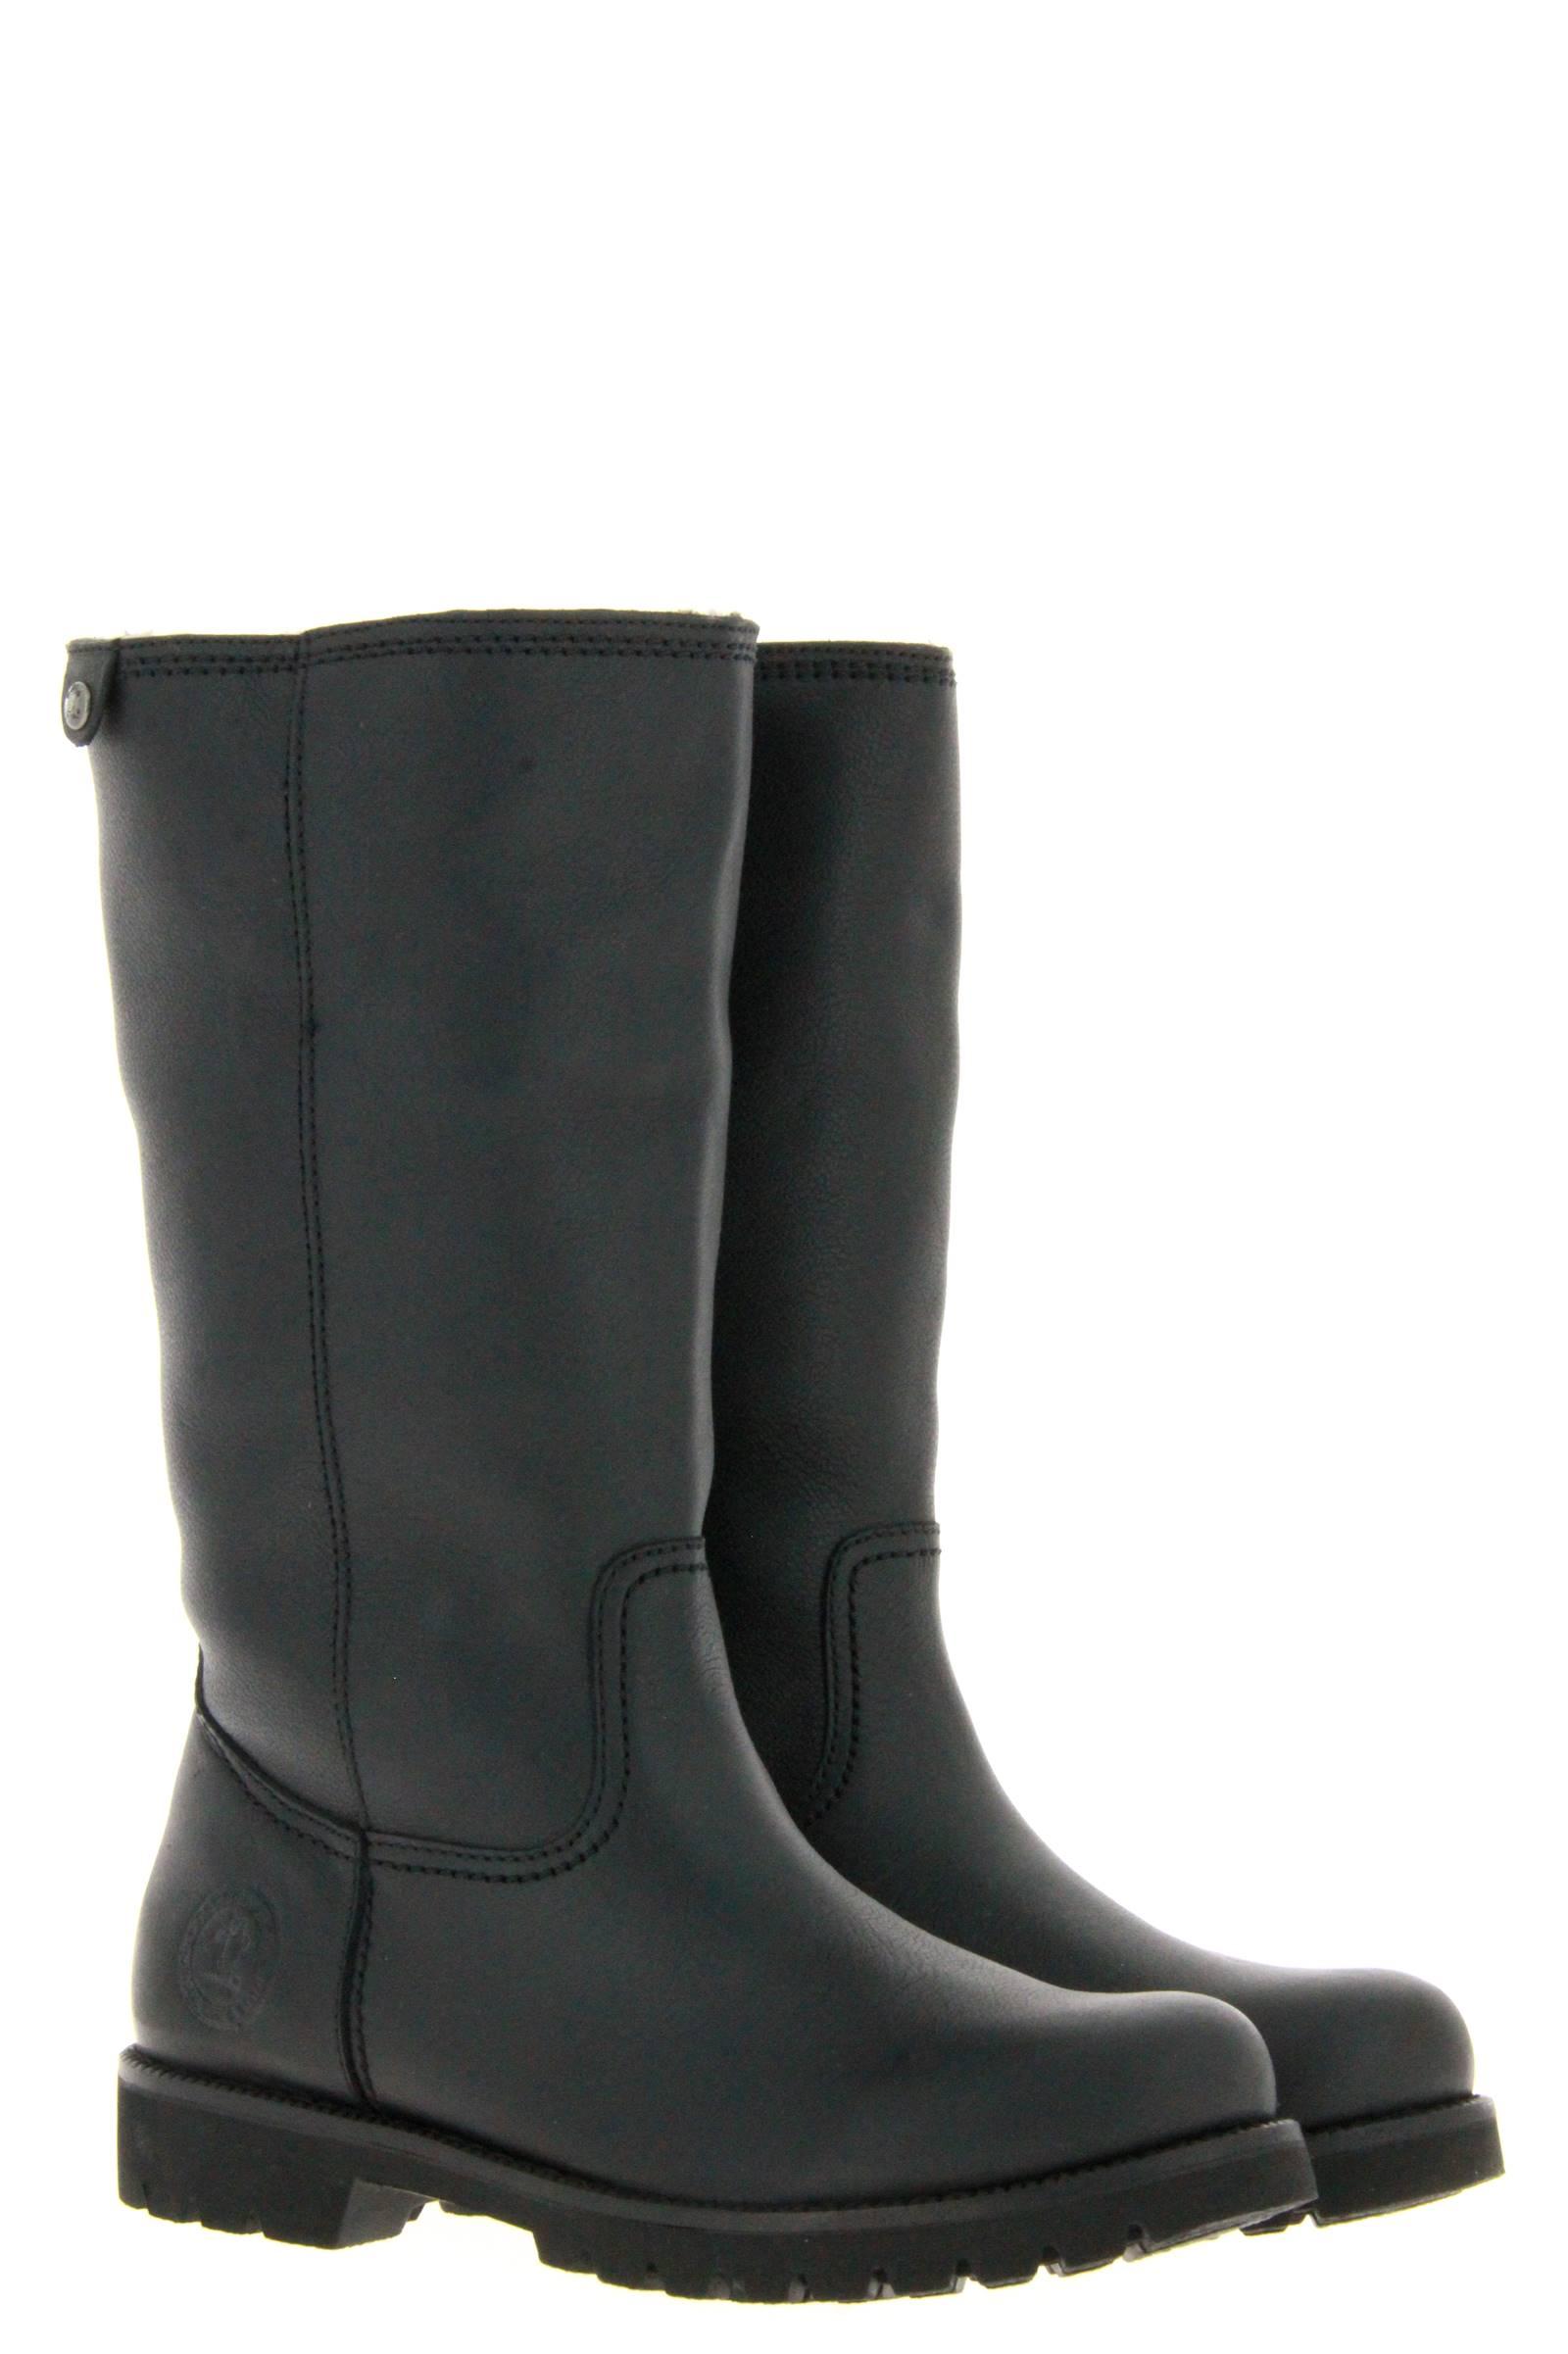 Panama Jack boots lined BAMBINA IGLOO B3 NAPPA GRASS NEGRO BLACK